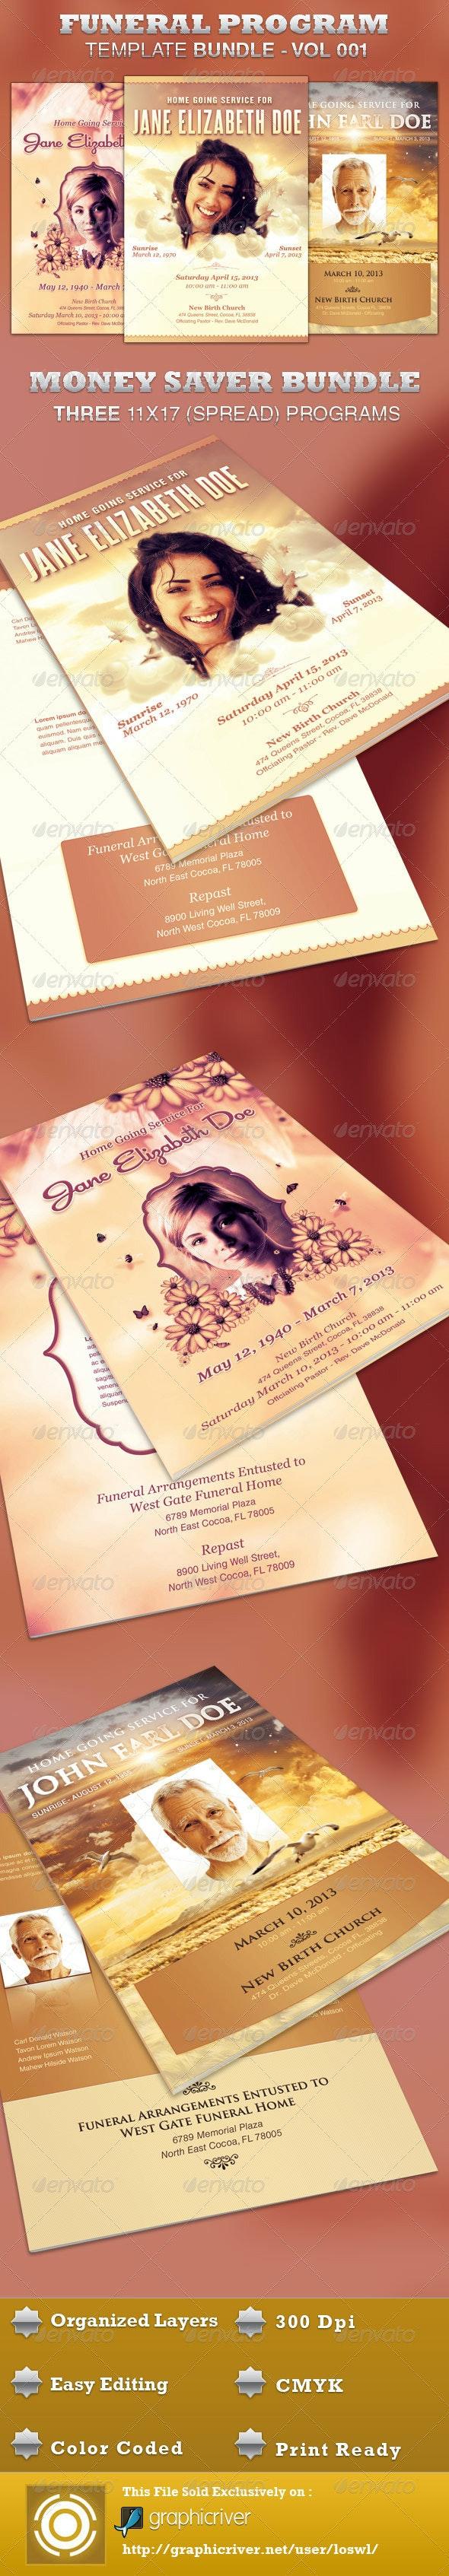 Funeral Program Template Bundle-Vol 001 - Informational Brochures